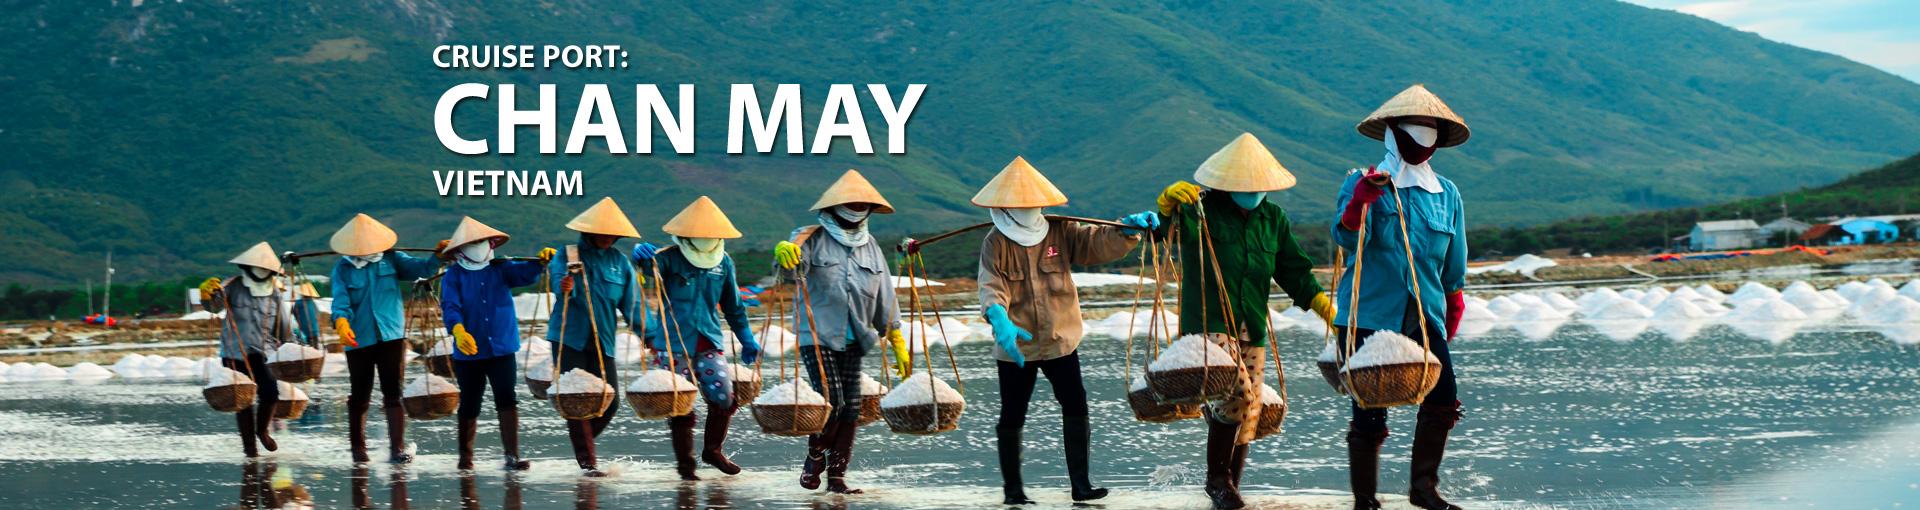 Cruises to Chan May, Vietnam